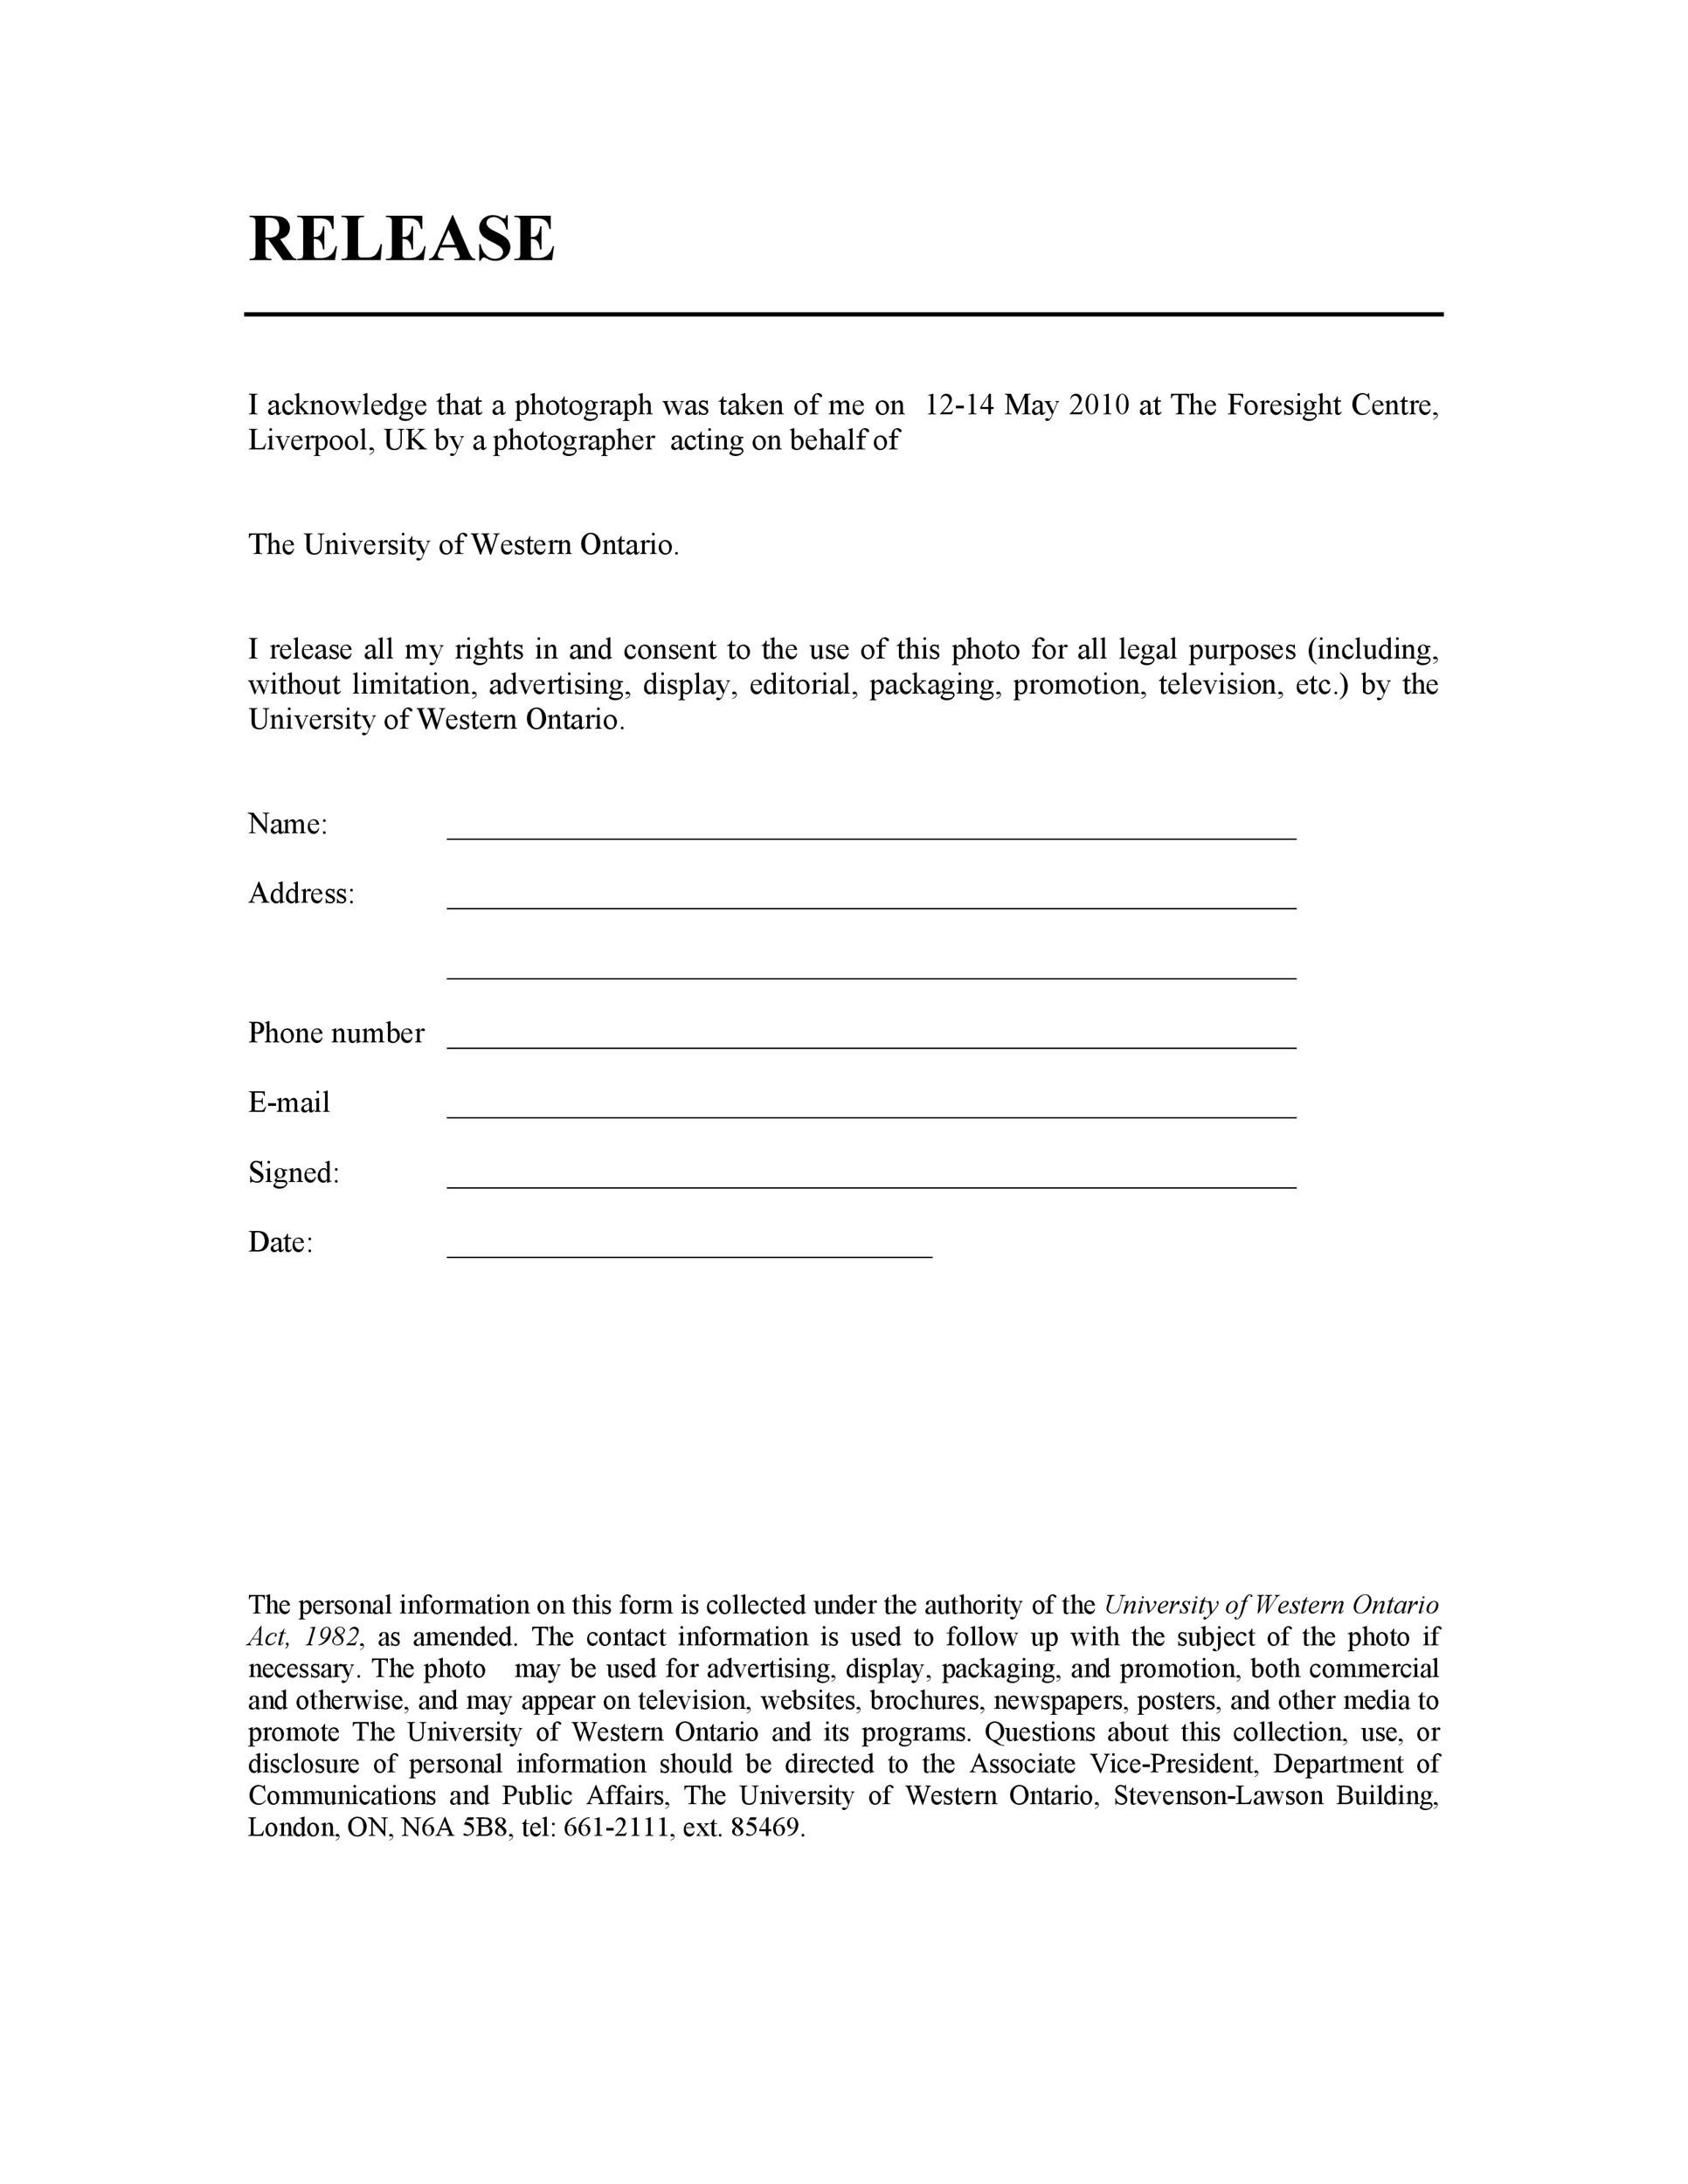 Free model release form 33